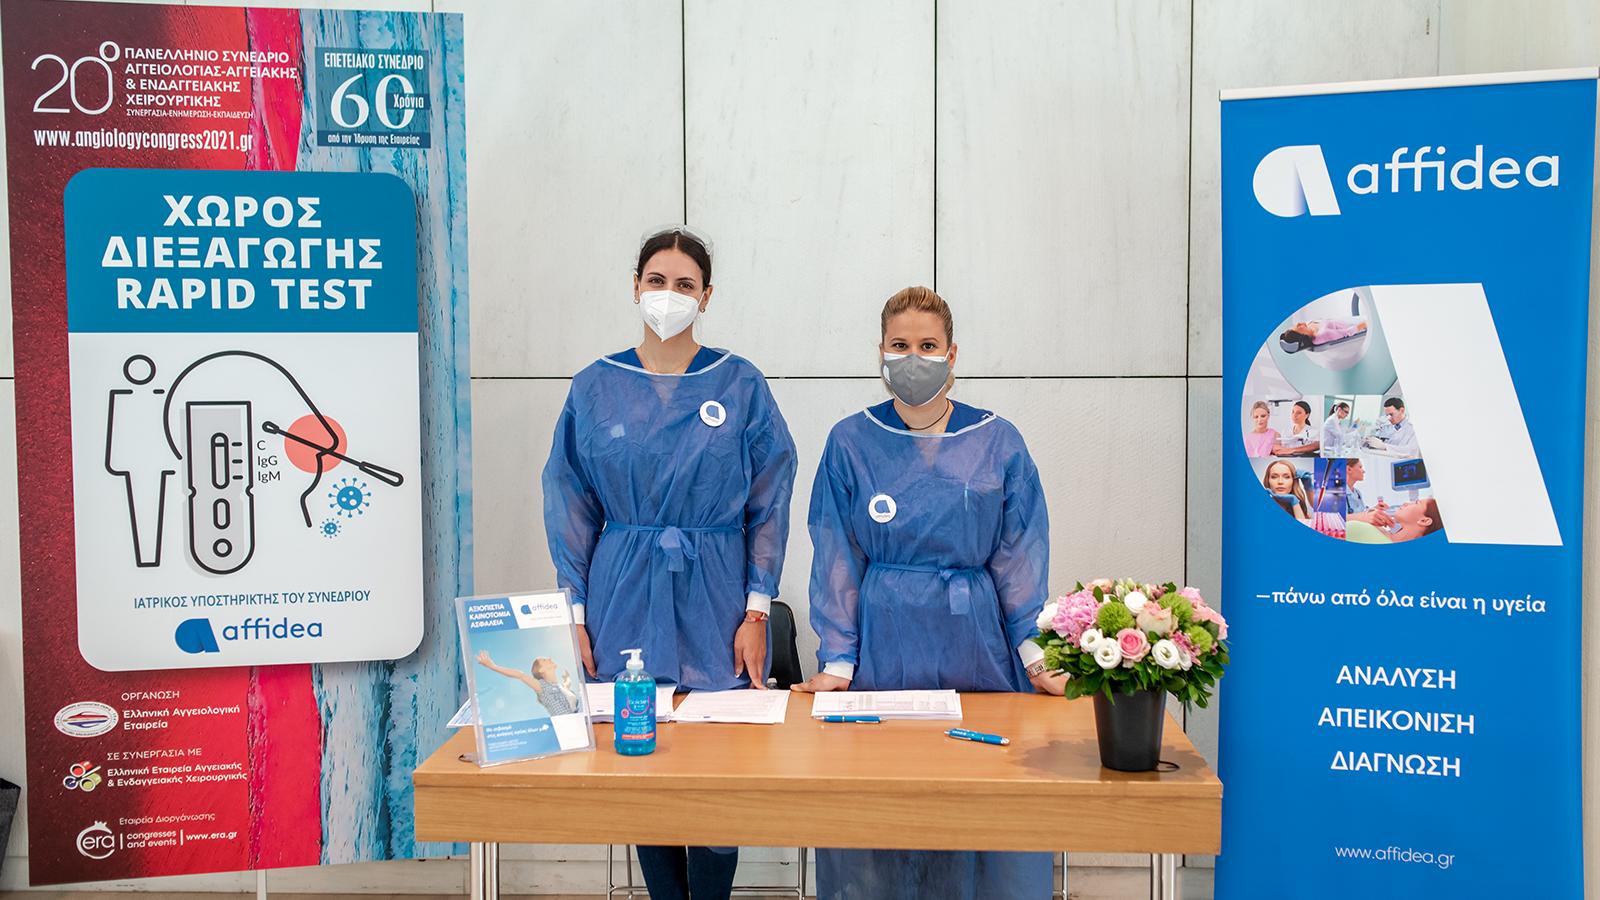 Affidea: «Ιατρικός Υποστηρικτής» στο 20ό Πανελλήνιο Συνέδριο Αγγειολογίας, Αγγειακής & Ενδαγγειακής Χειρουργικής